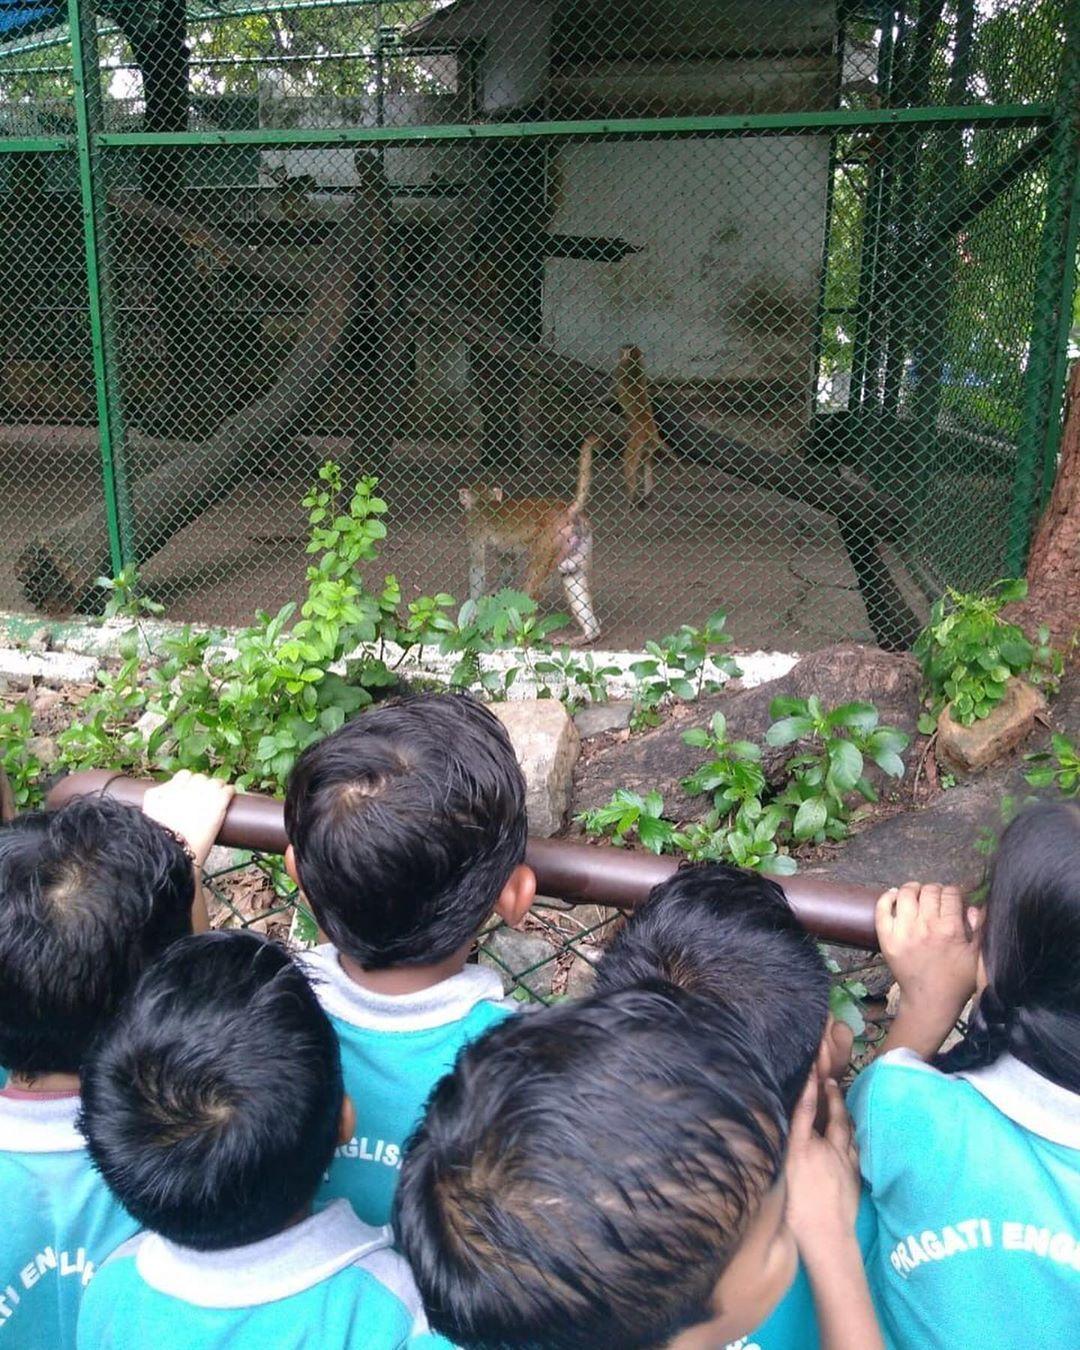 Pragati Preschool Grade Senior Kg Students Visited Kankaria Zoo